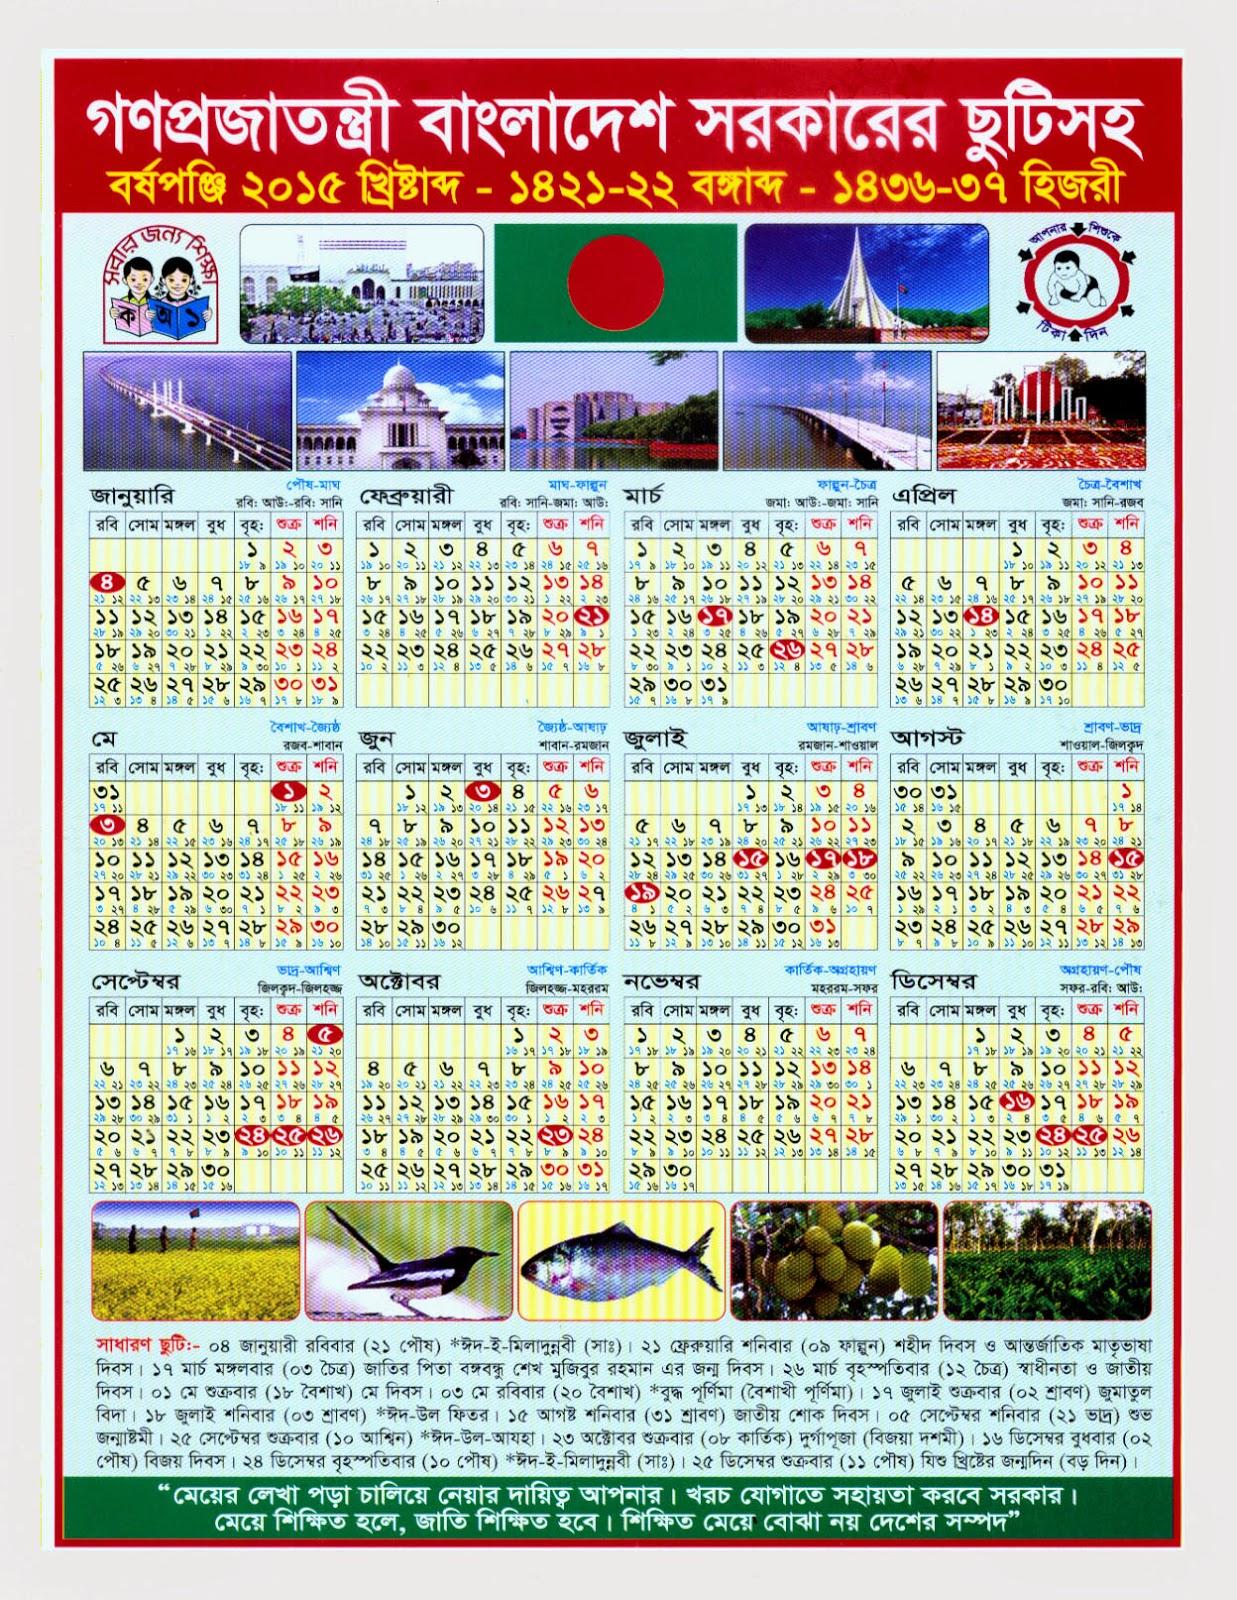 Bd Calendar 2015 Pdf intended for Bangla Calendar 2015